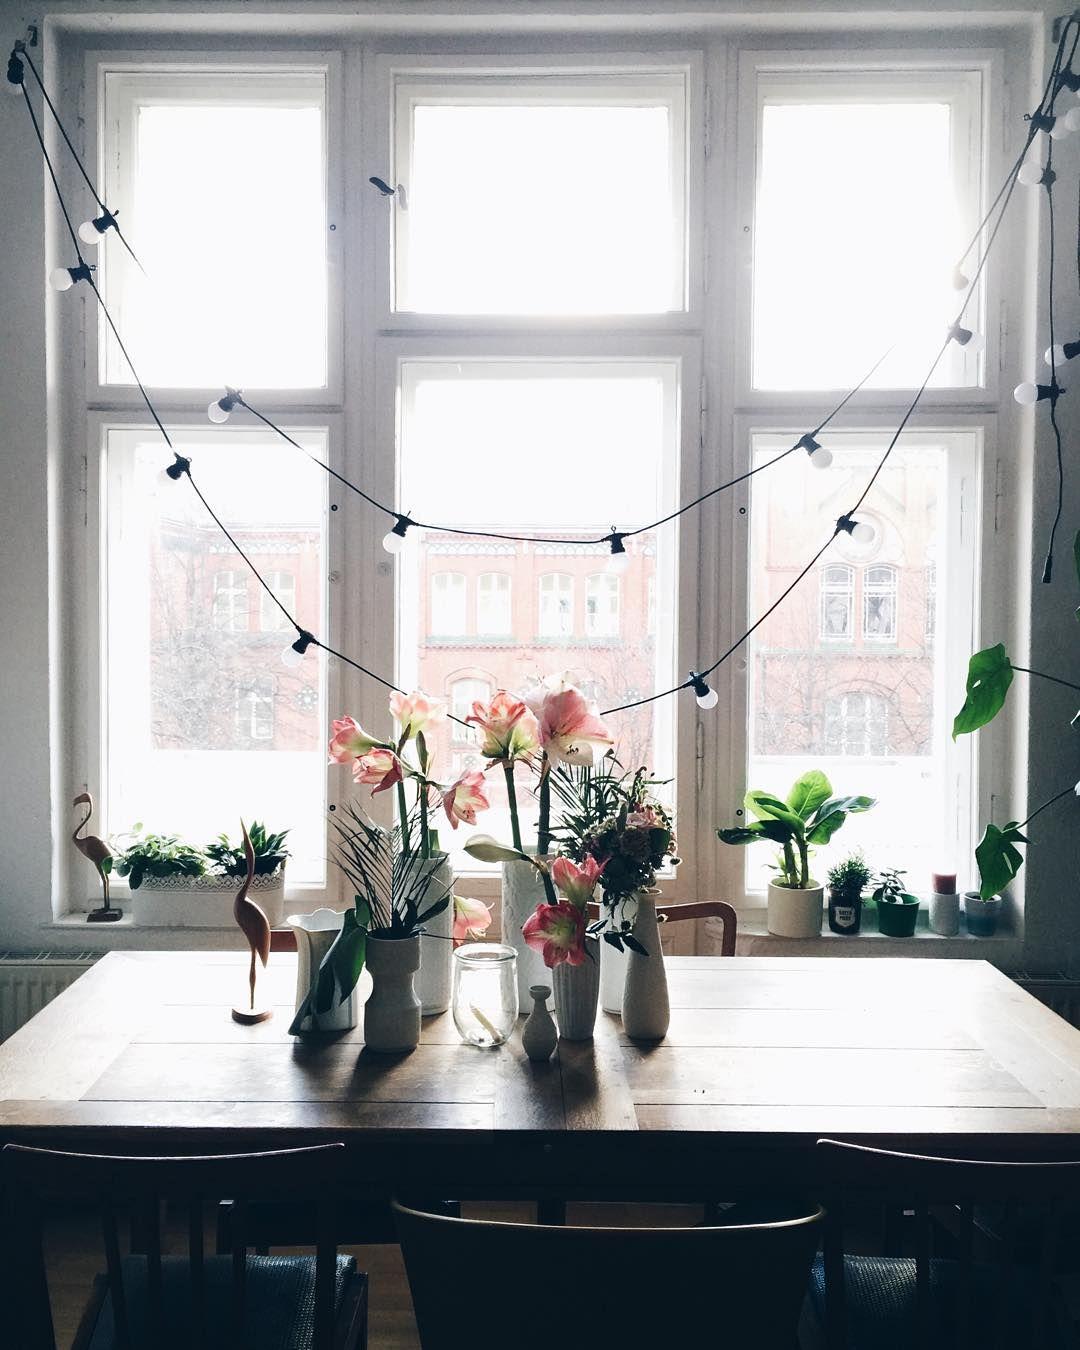 Lights Over Dining Room Table: String Lights Over Dining Room Table